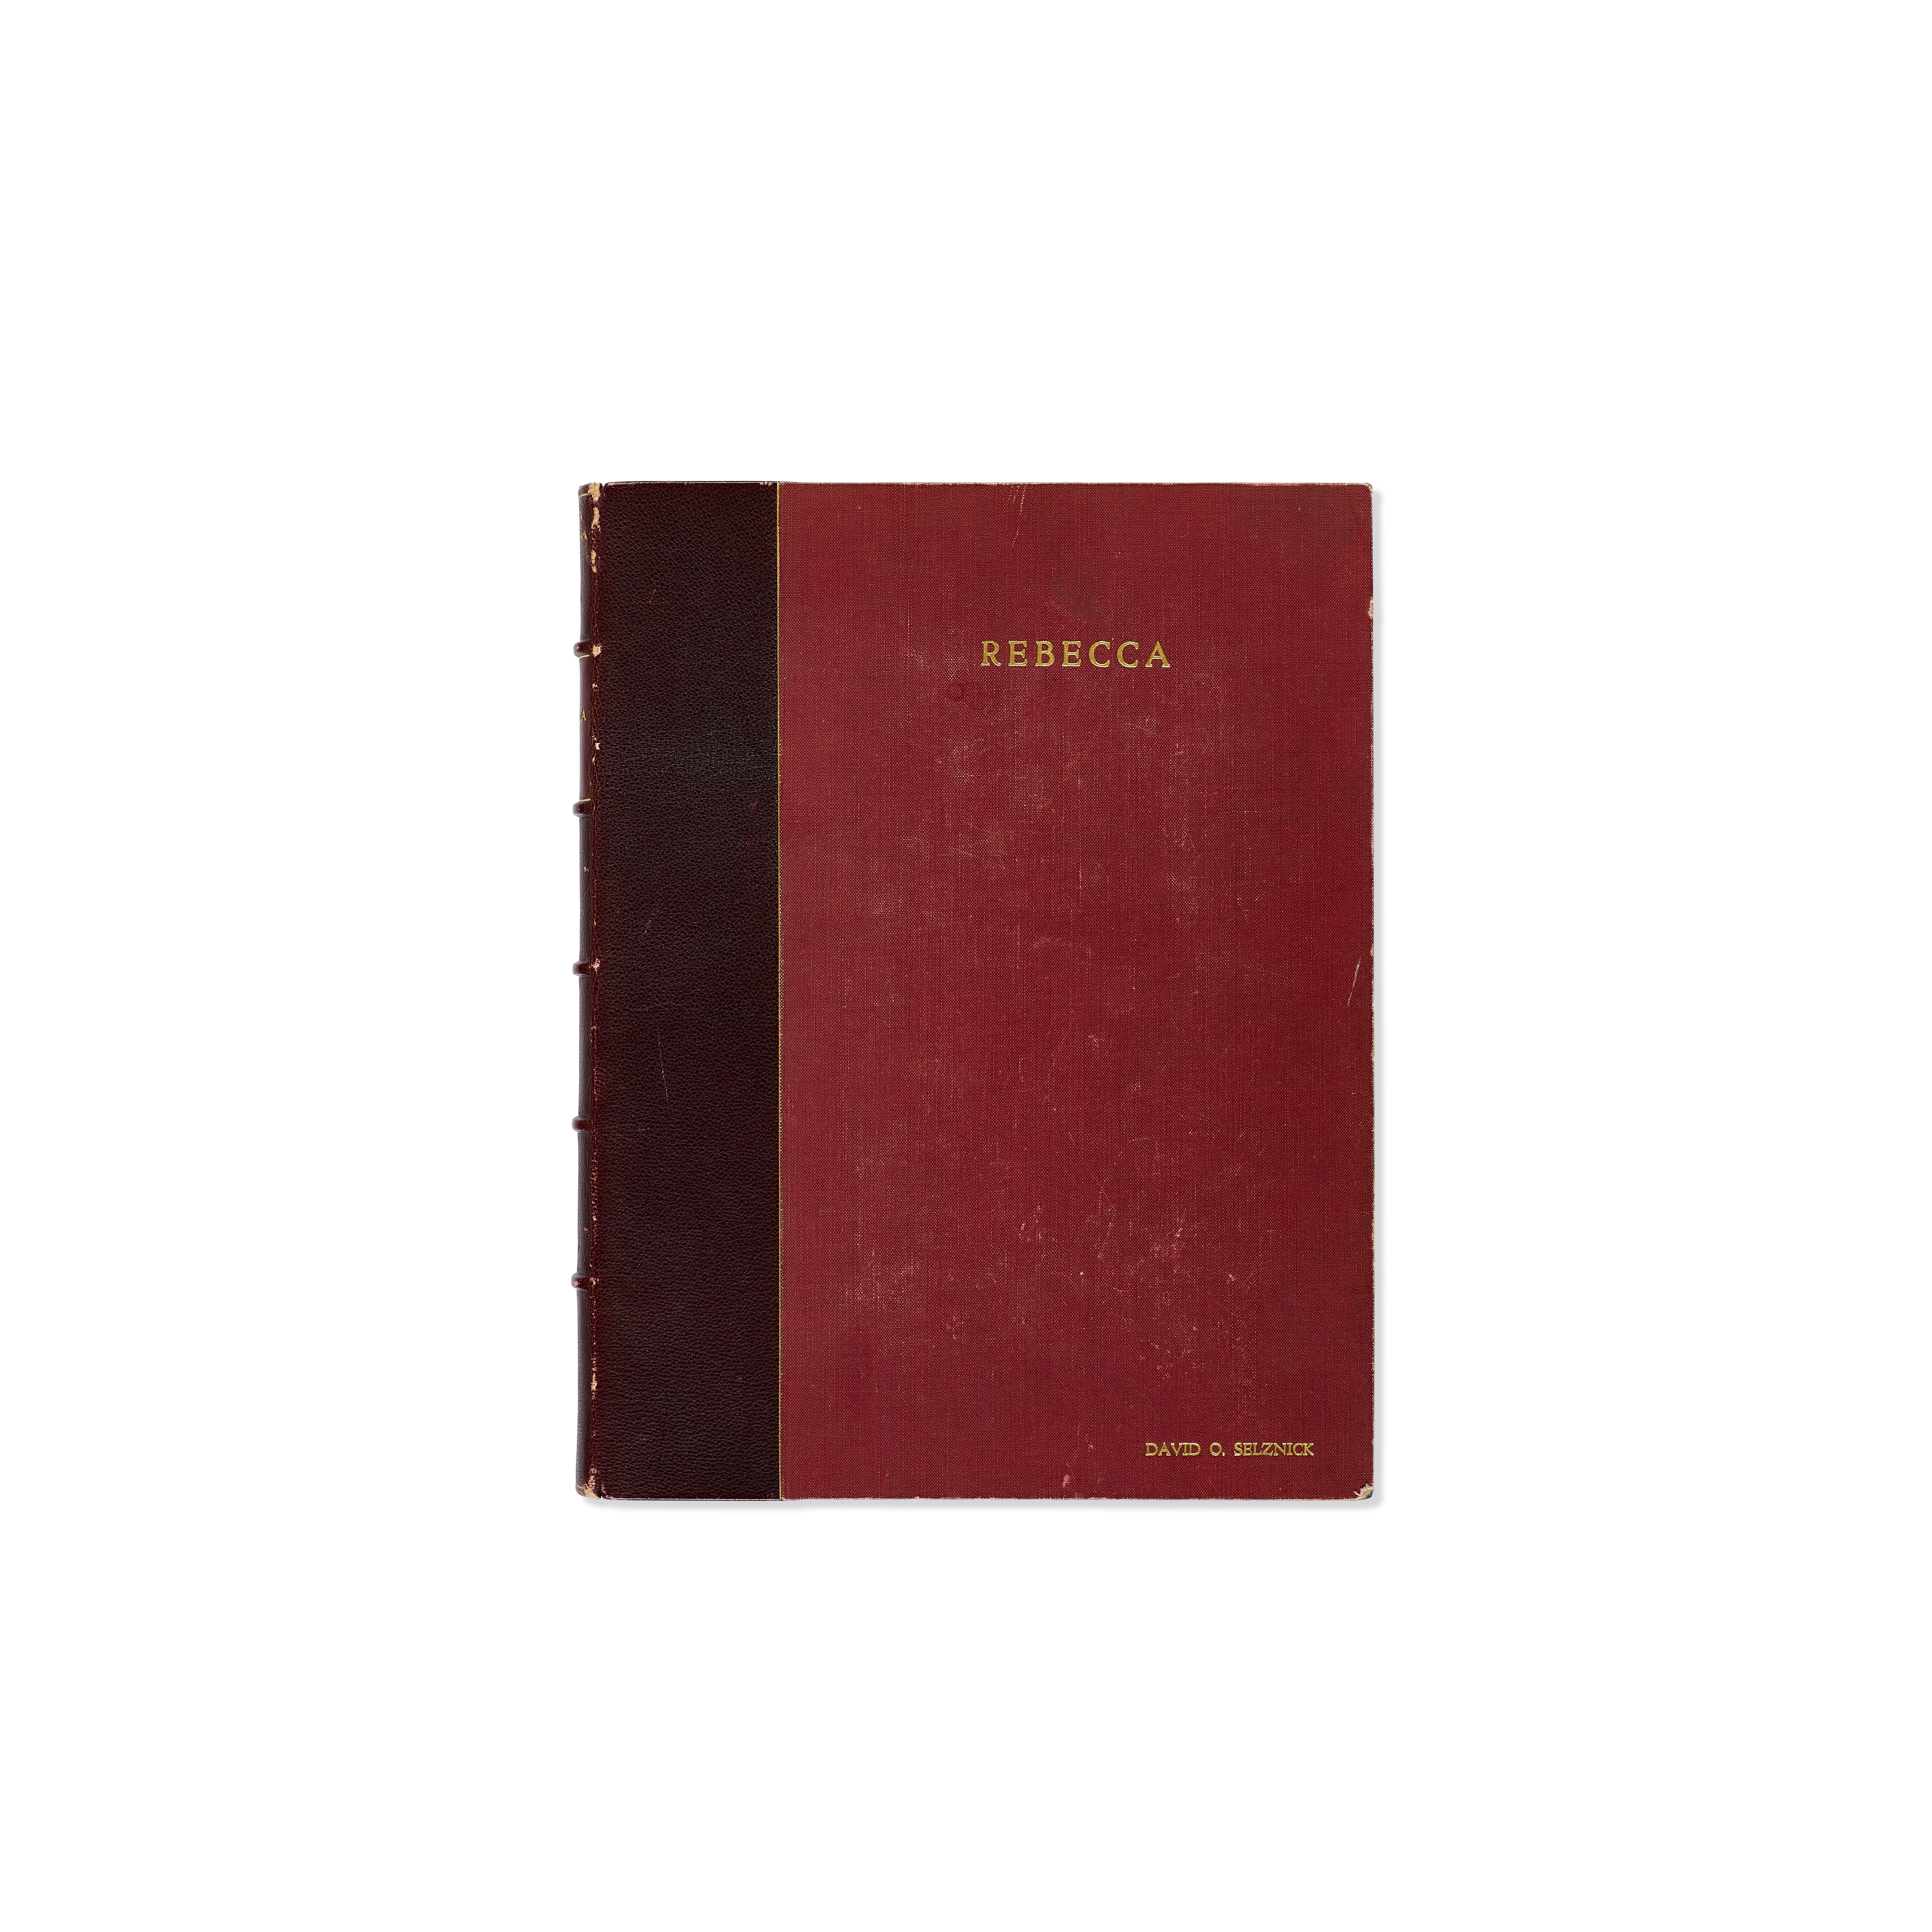 A David O. Selznick custom-bound screenplay of Rebecca